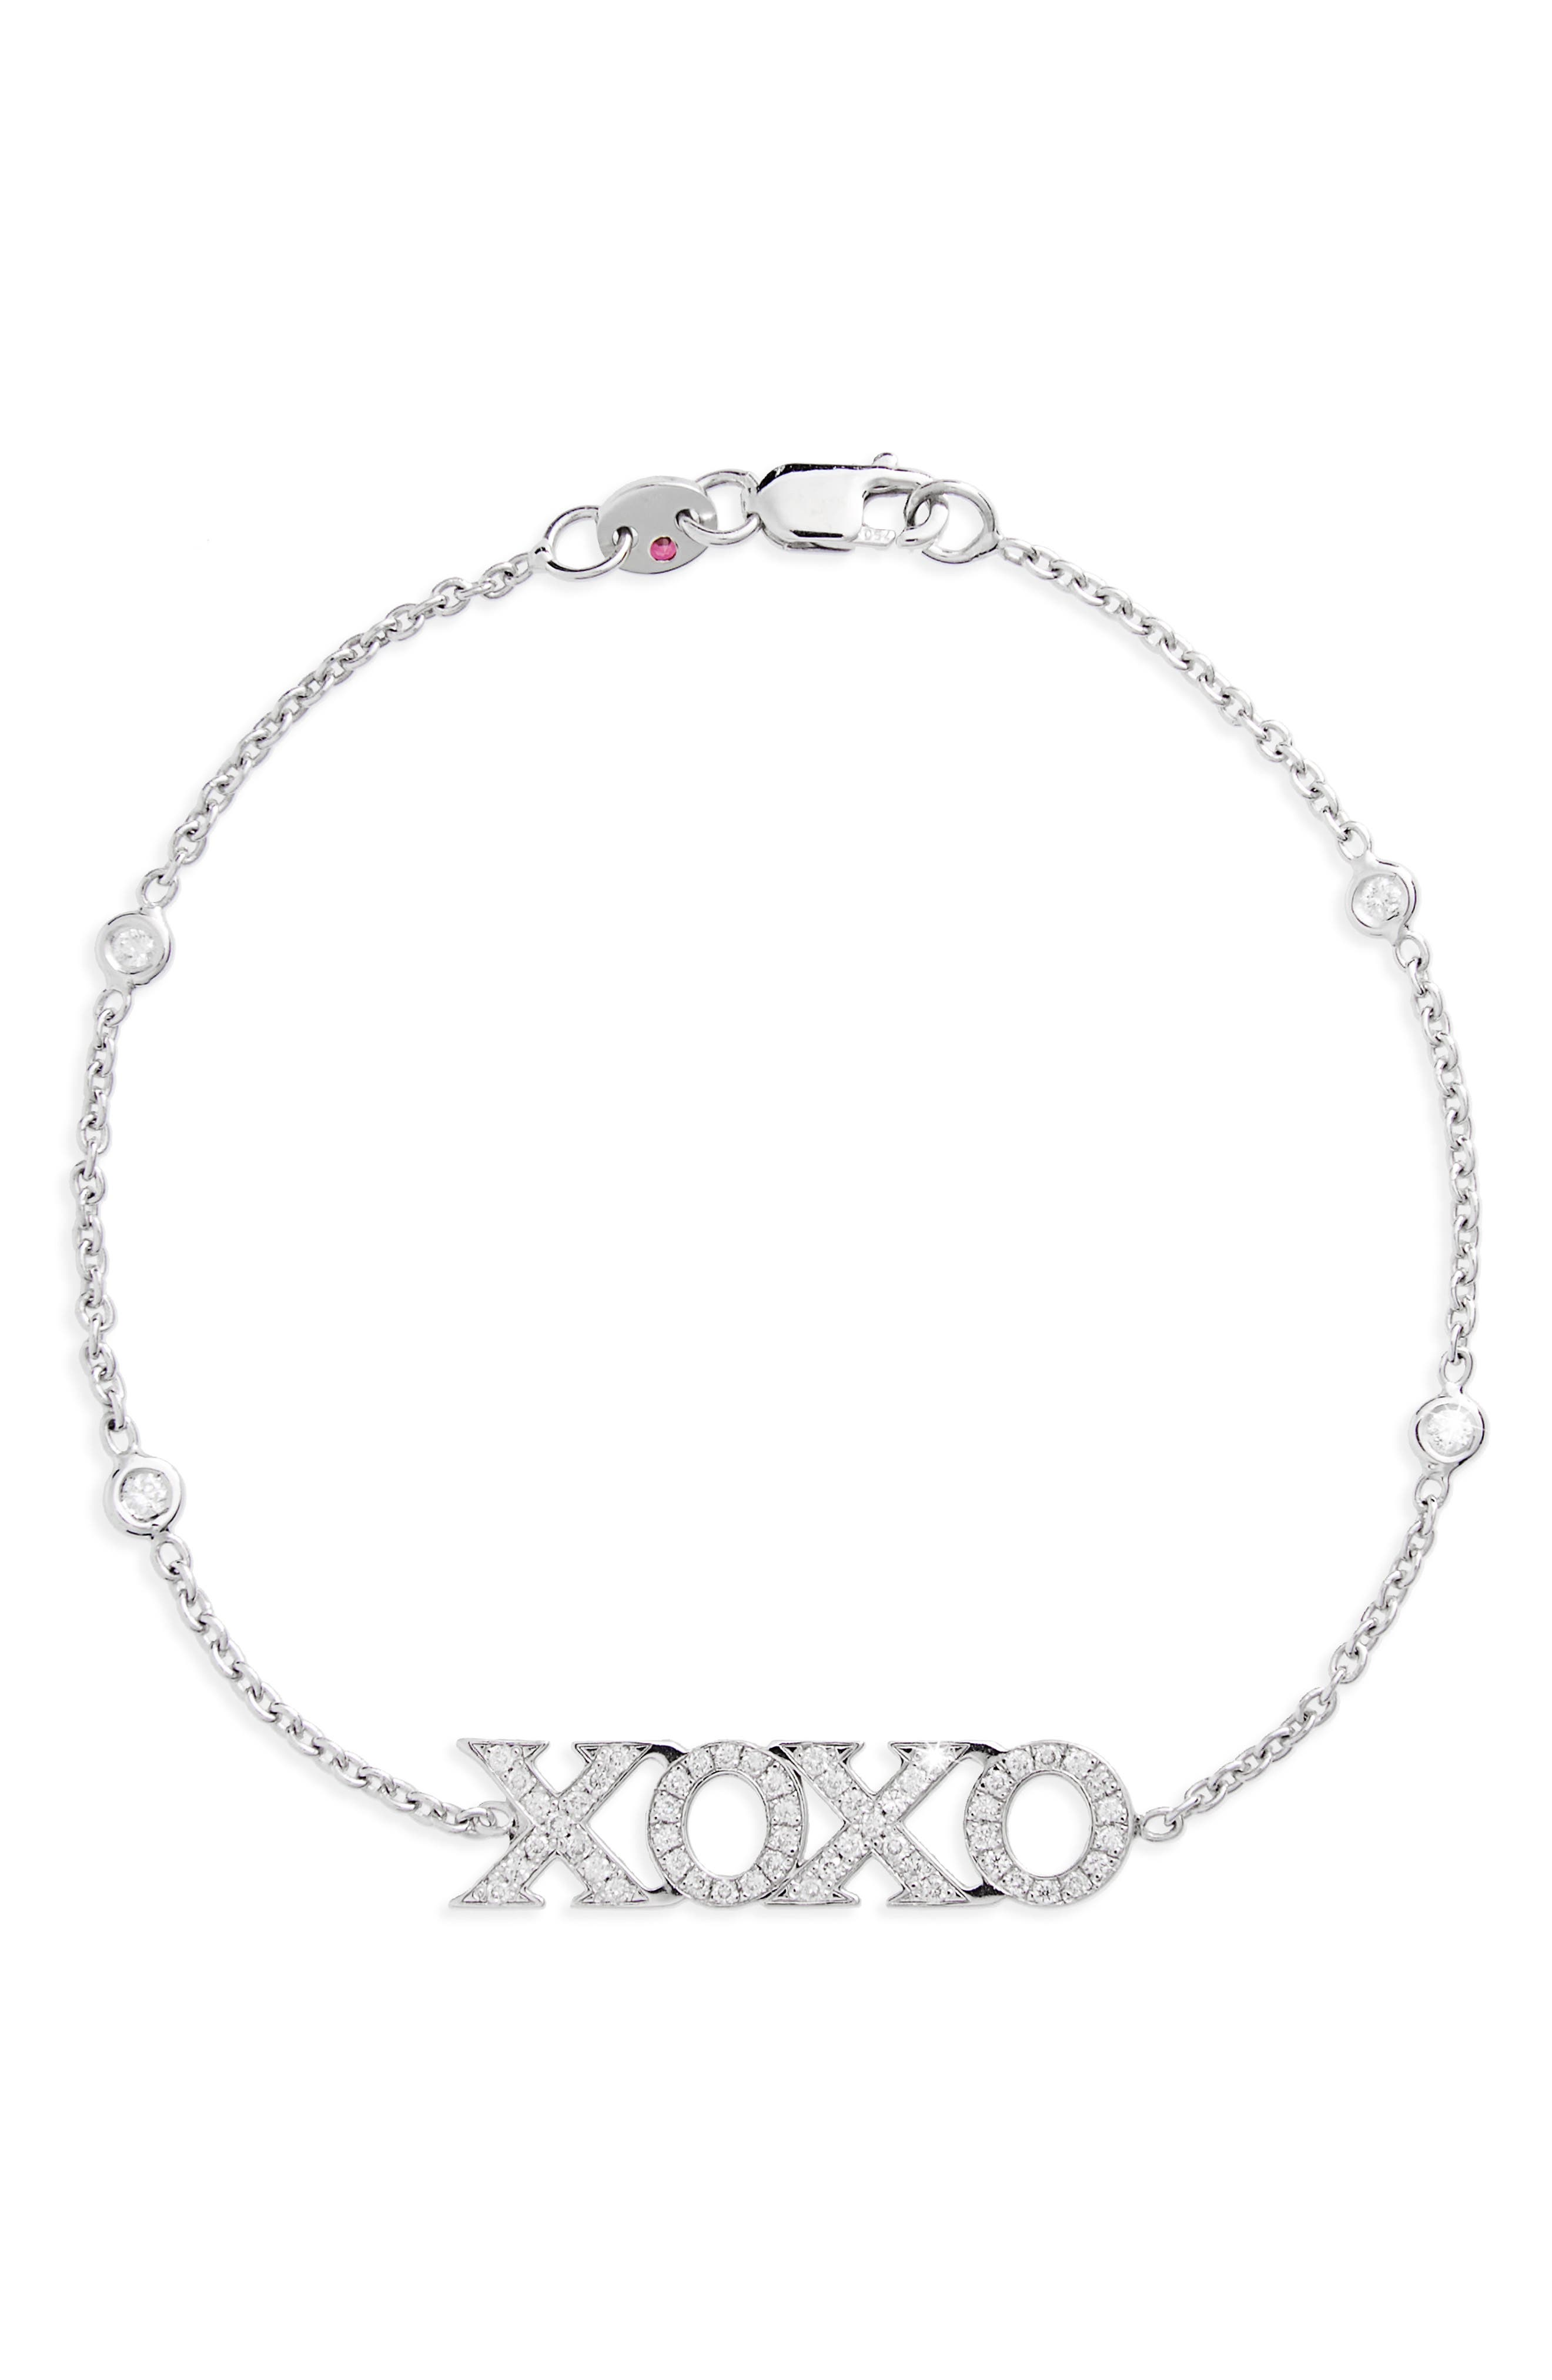 XOXO Diamond Bracelet,                         Main,                         color, White Gold